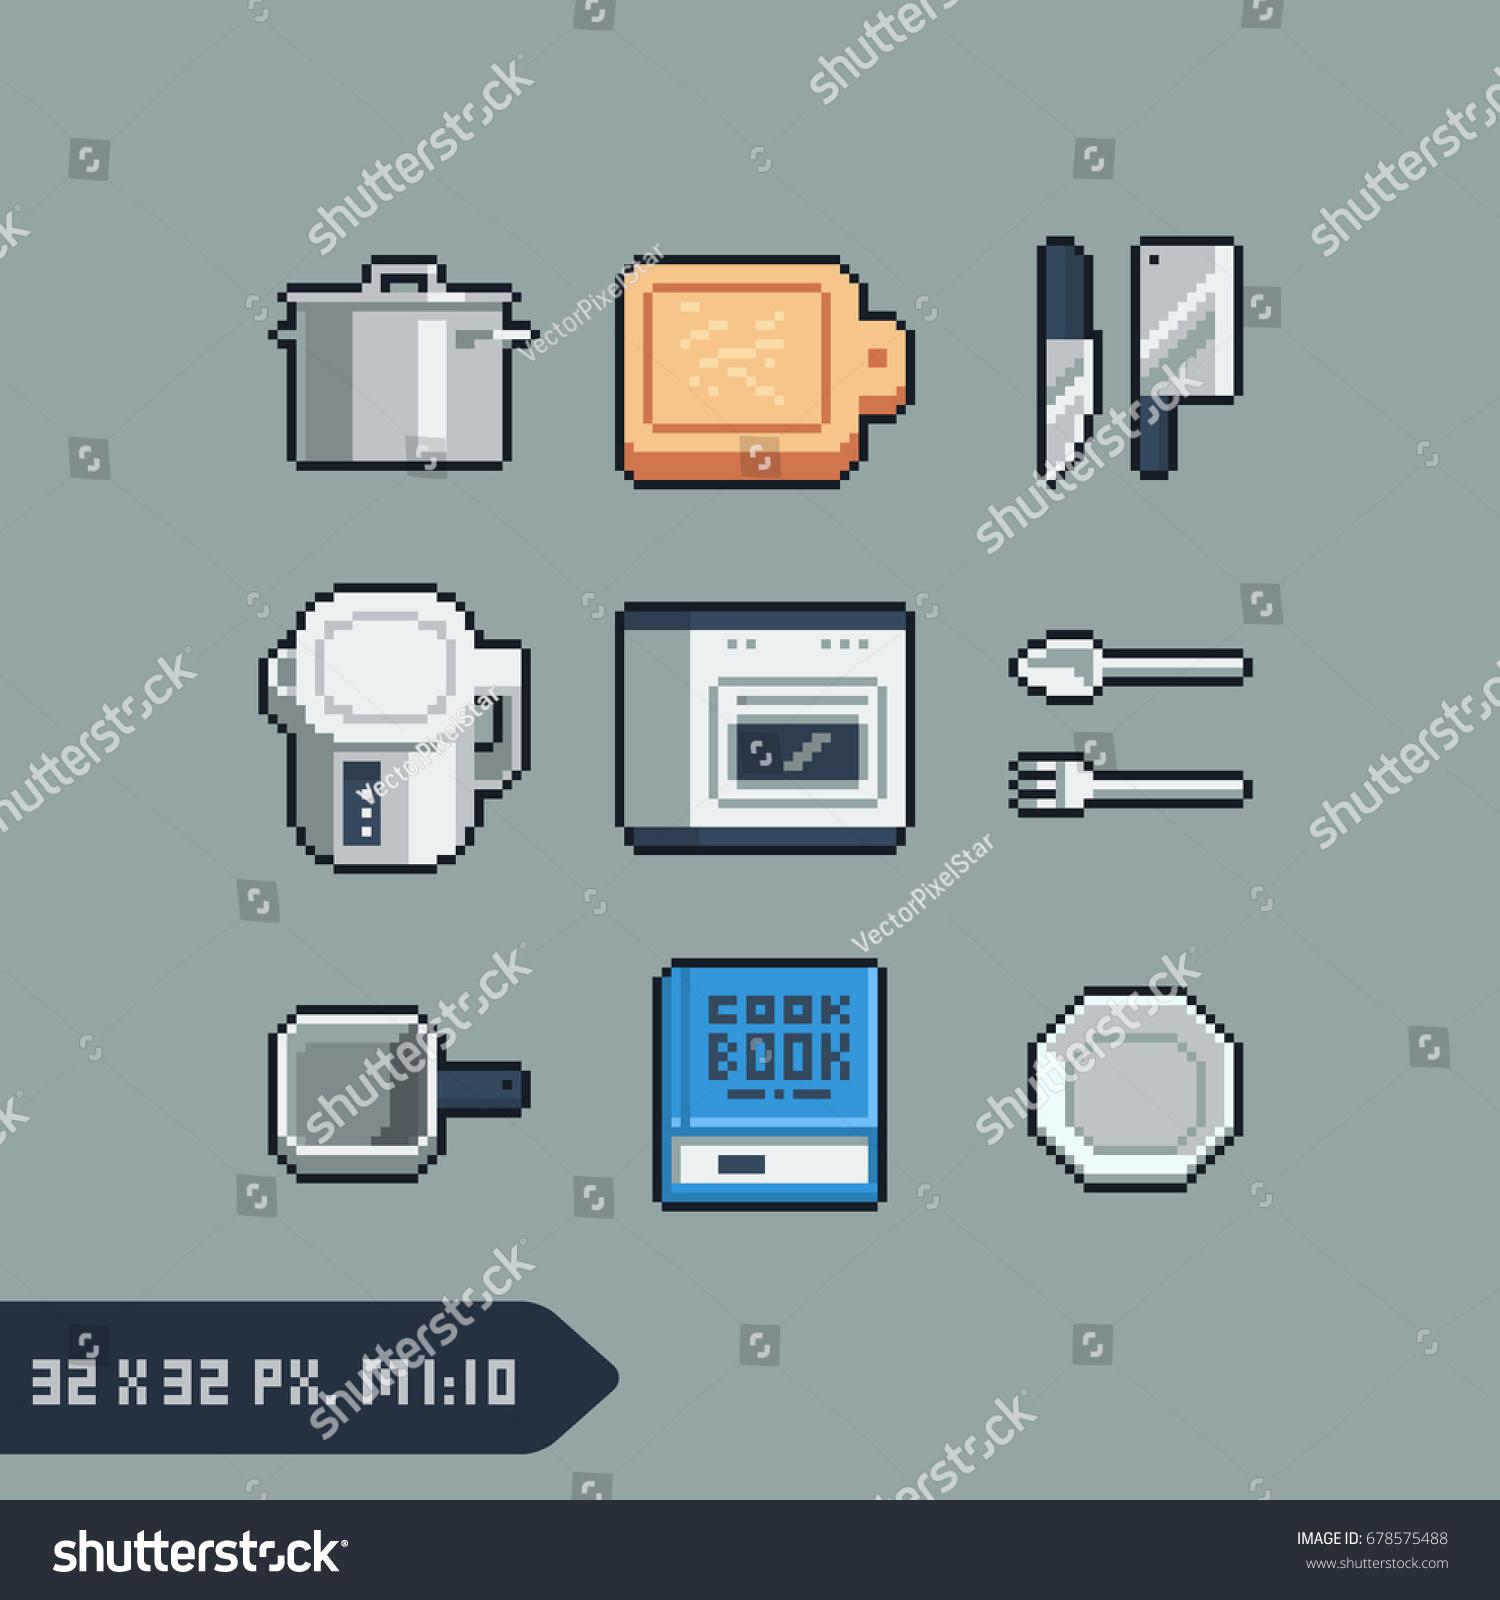 Set Kitchen Utensils Tools Icons Pixel Stock Vector (Royalty Free ...